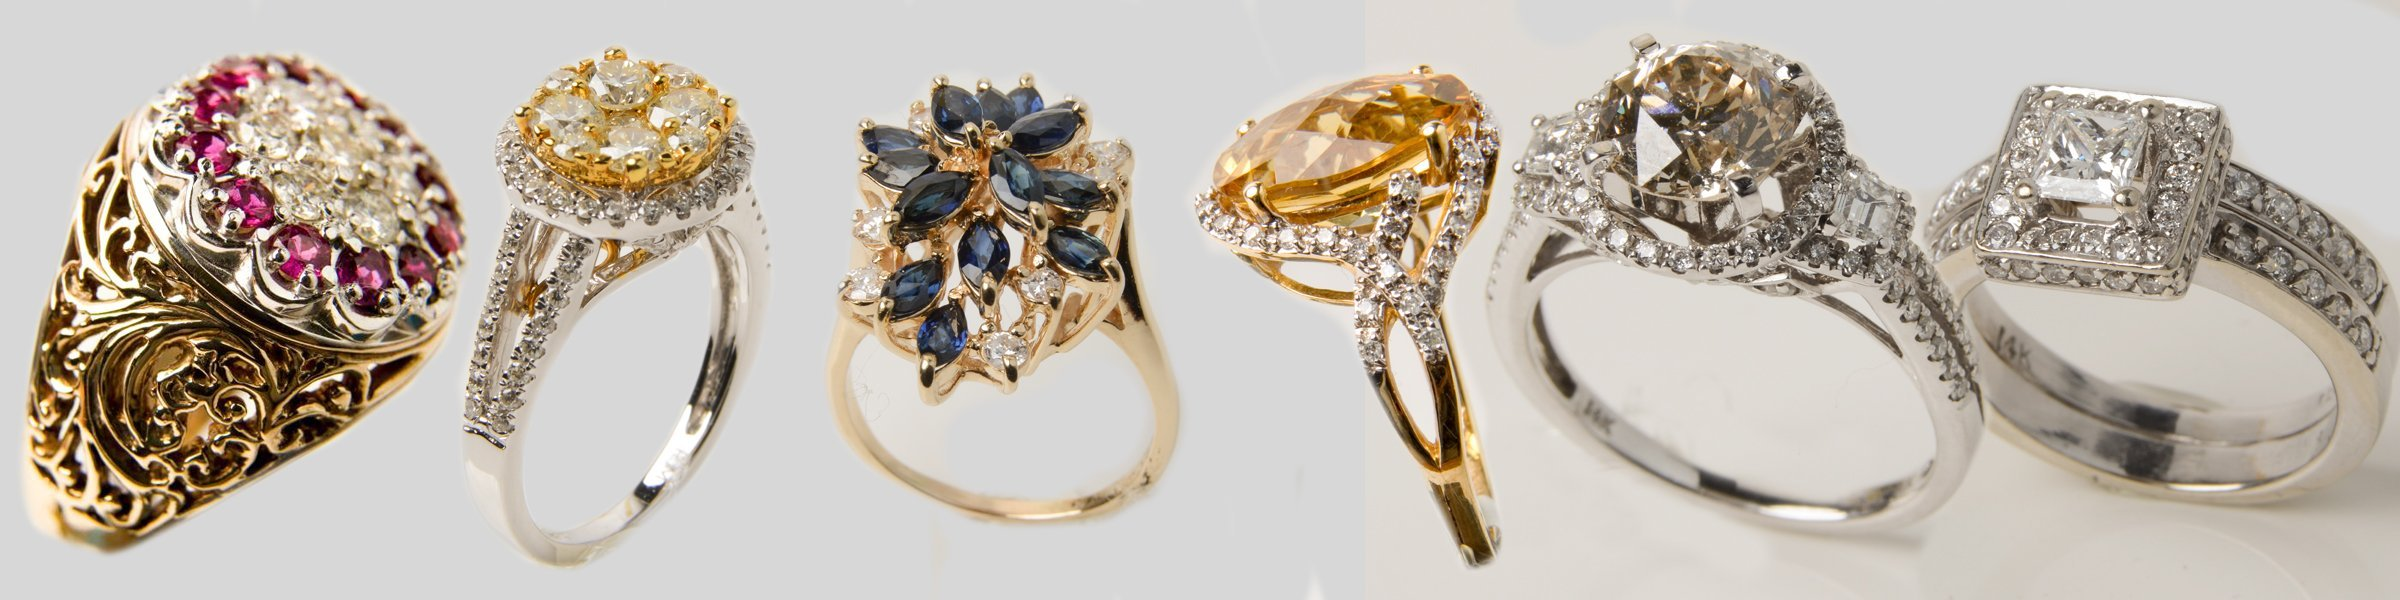 Diamond Rings at Pawn Shop Prices